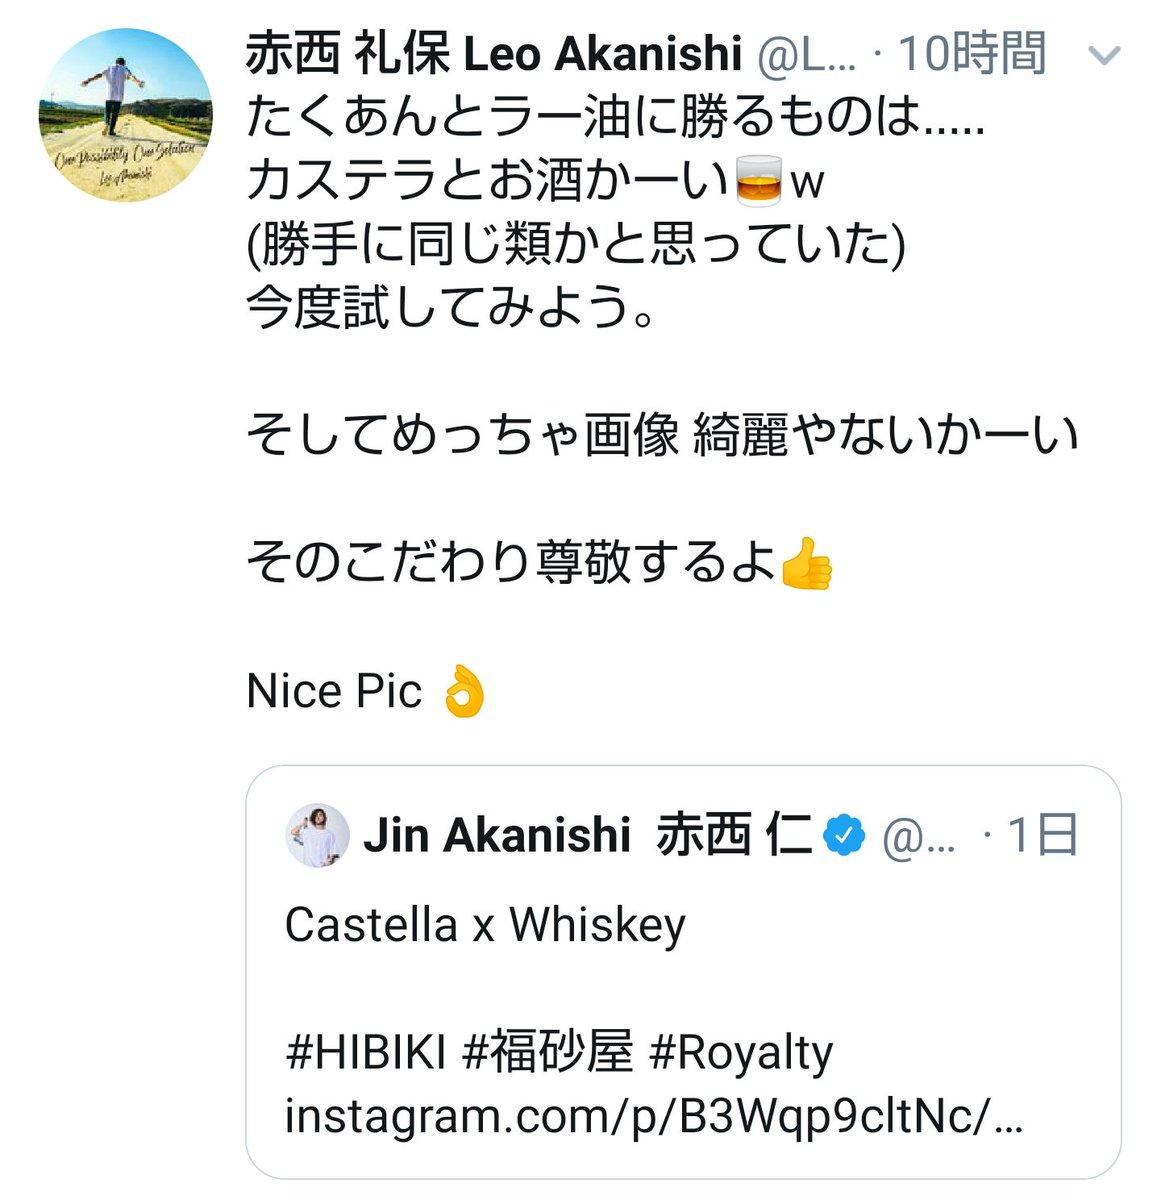 "「錦戸亮 礼保 twitter」の画像検索結果"""